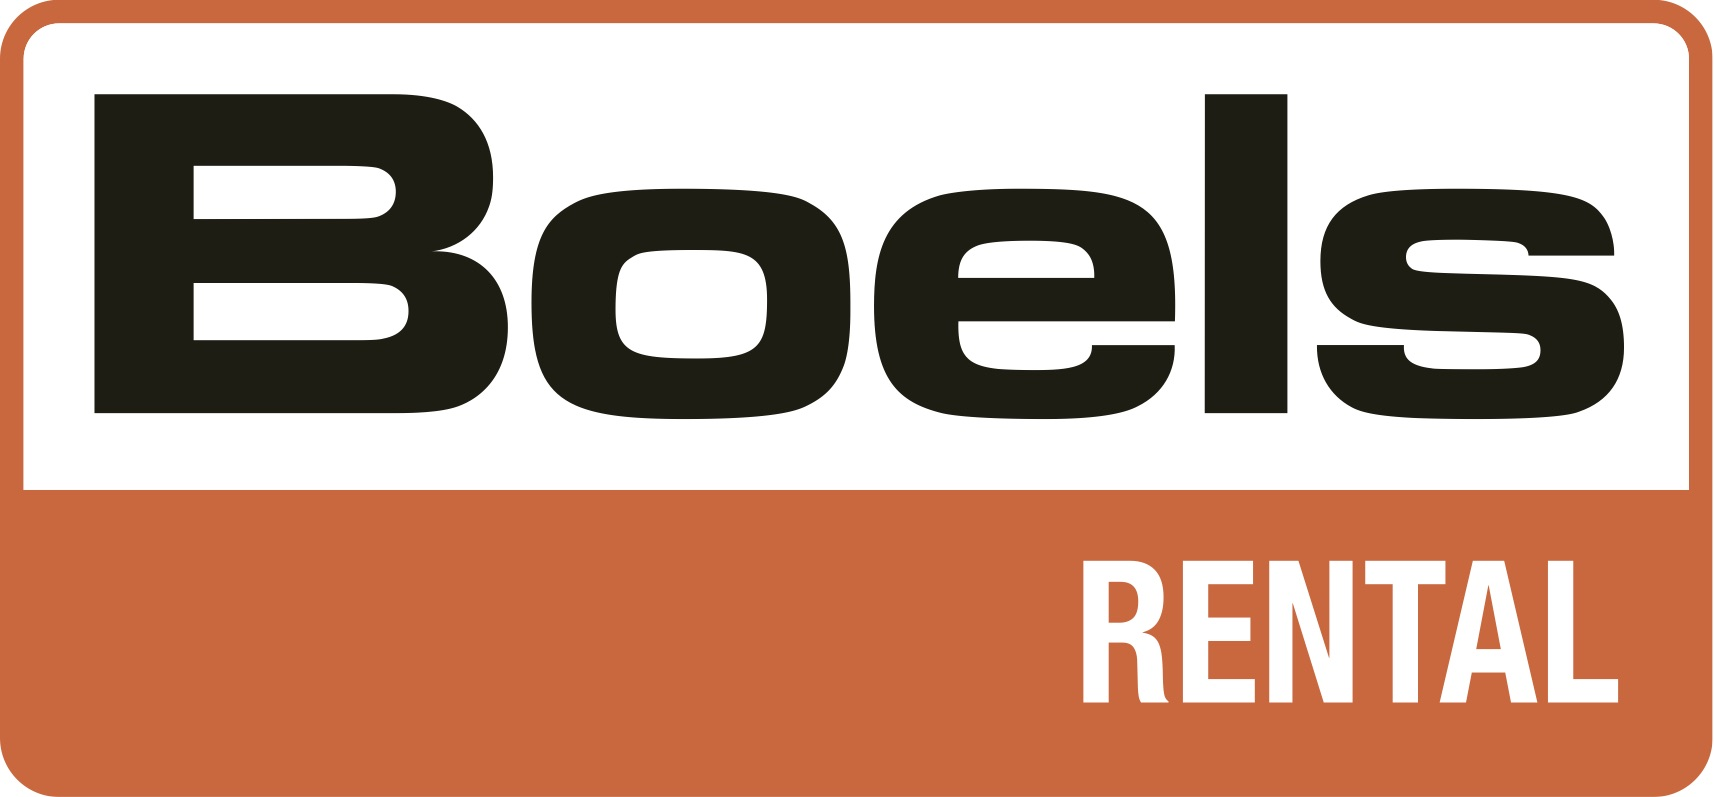 Boels Rental - logo